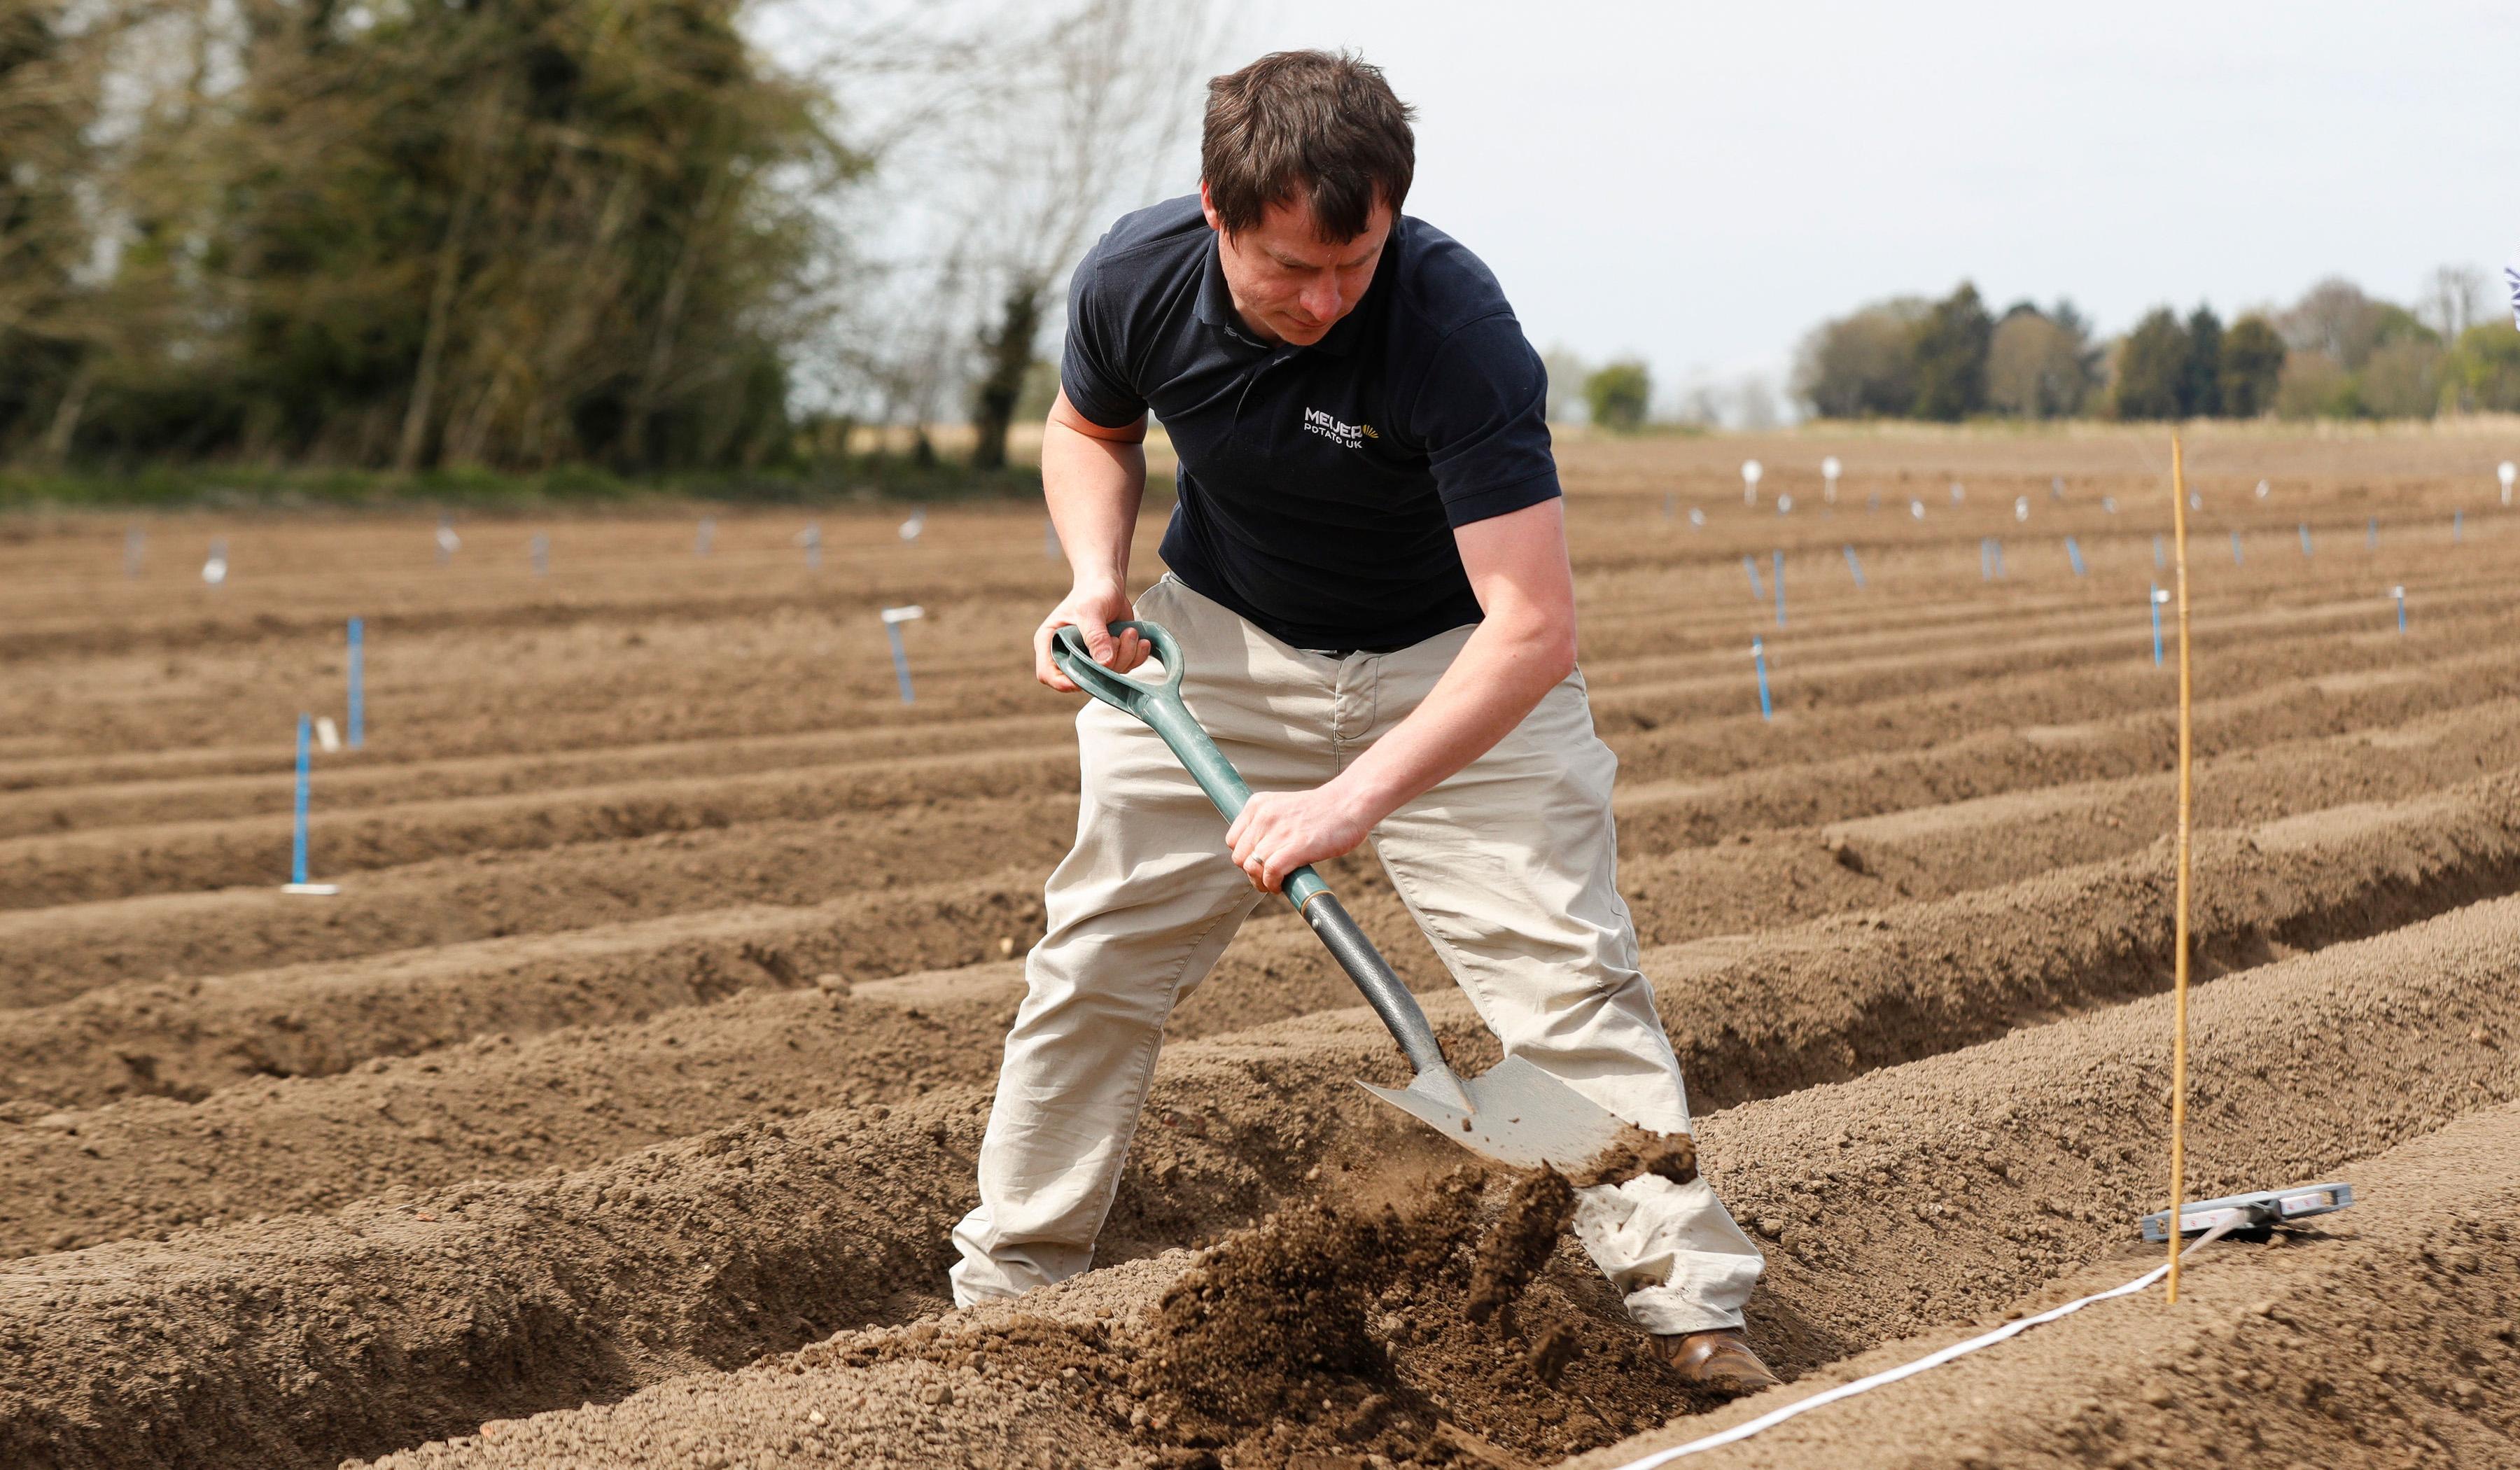 Meijer Potato install Soil Scout sensors